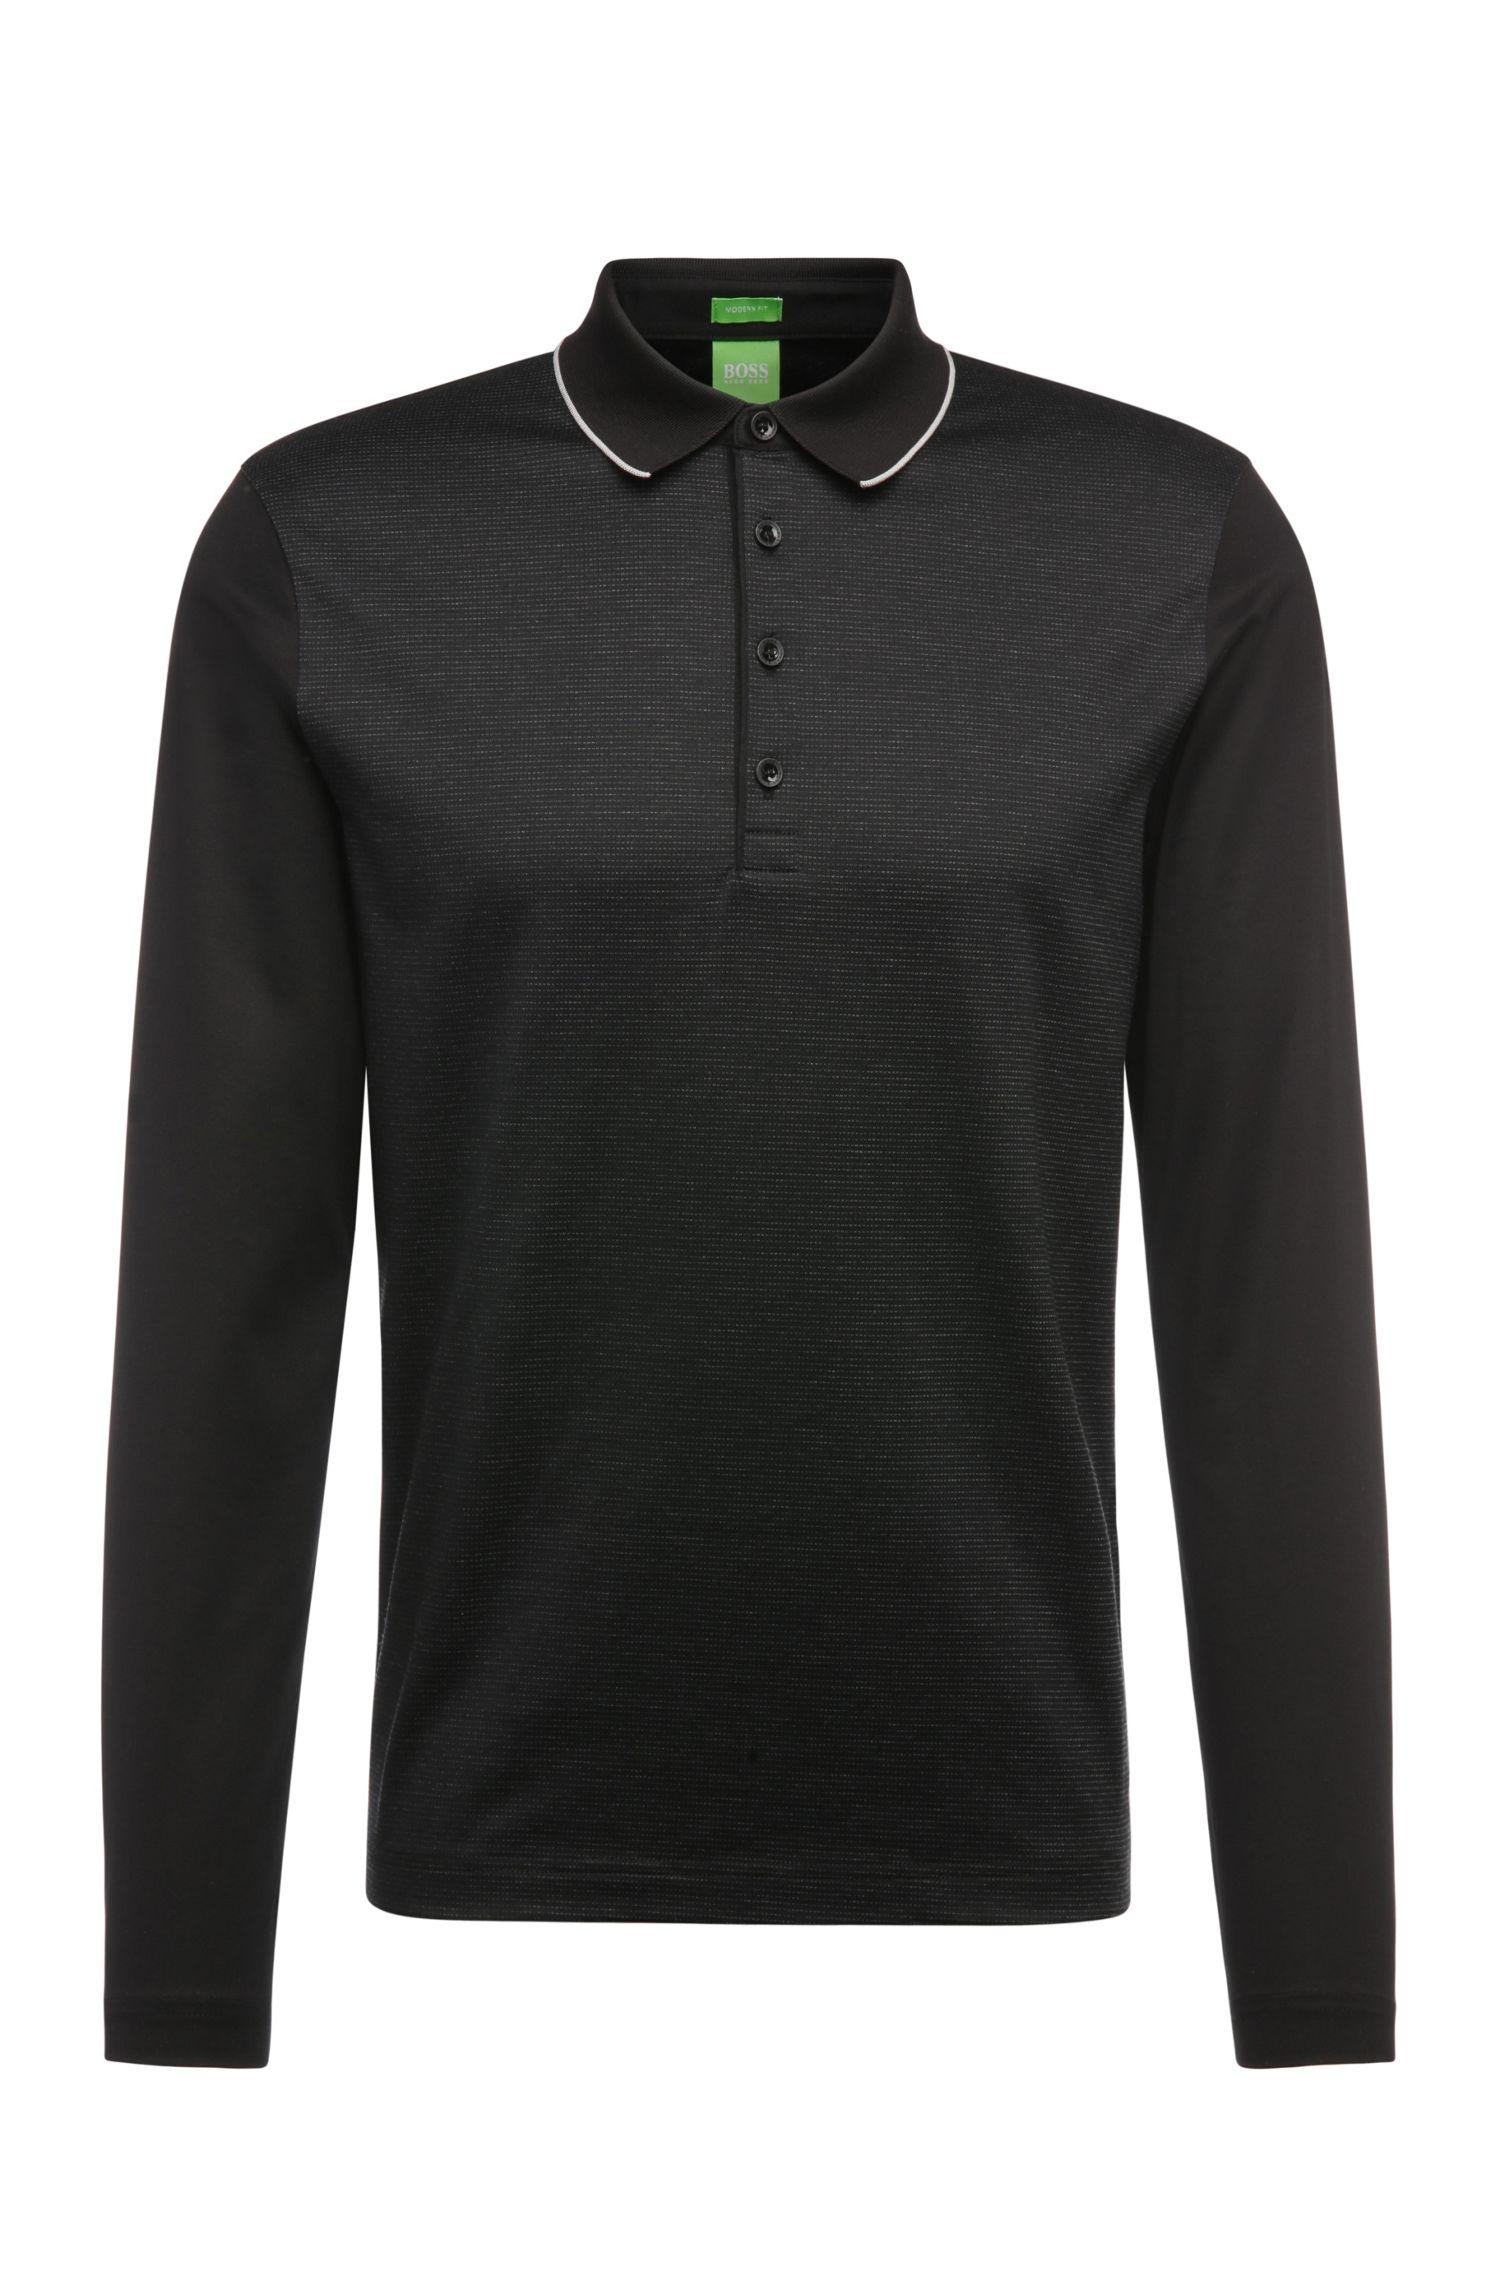 'C Acciano' | Modern Fit, Cotton Polo Shirt